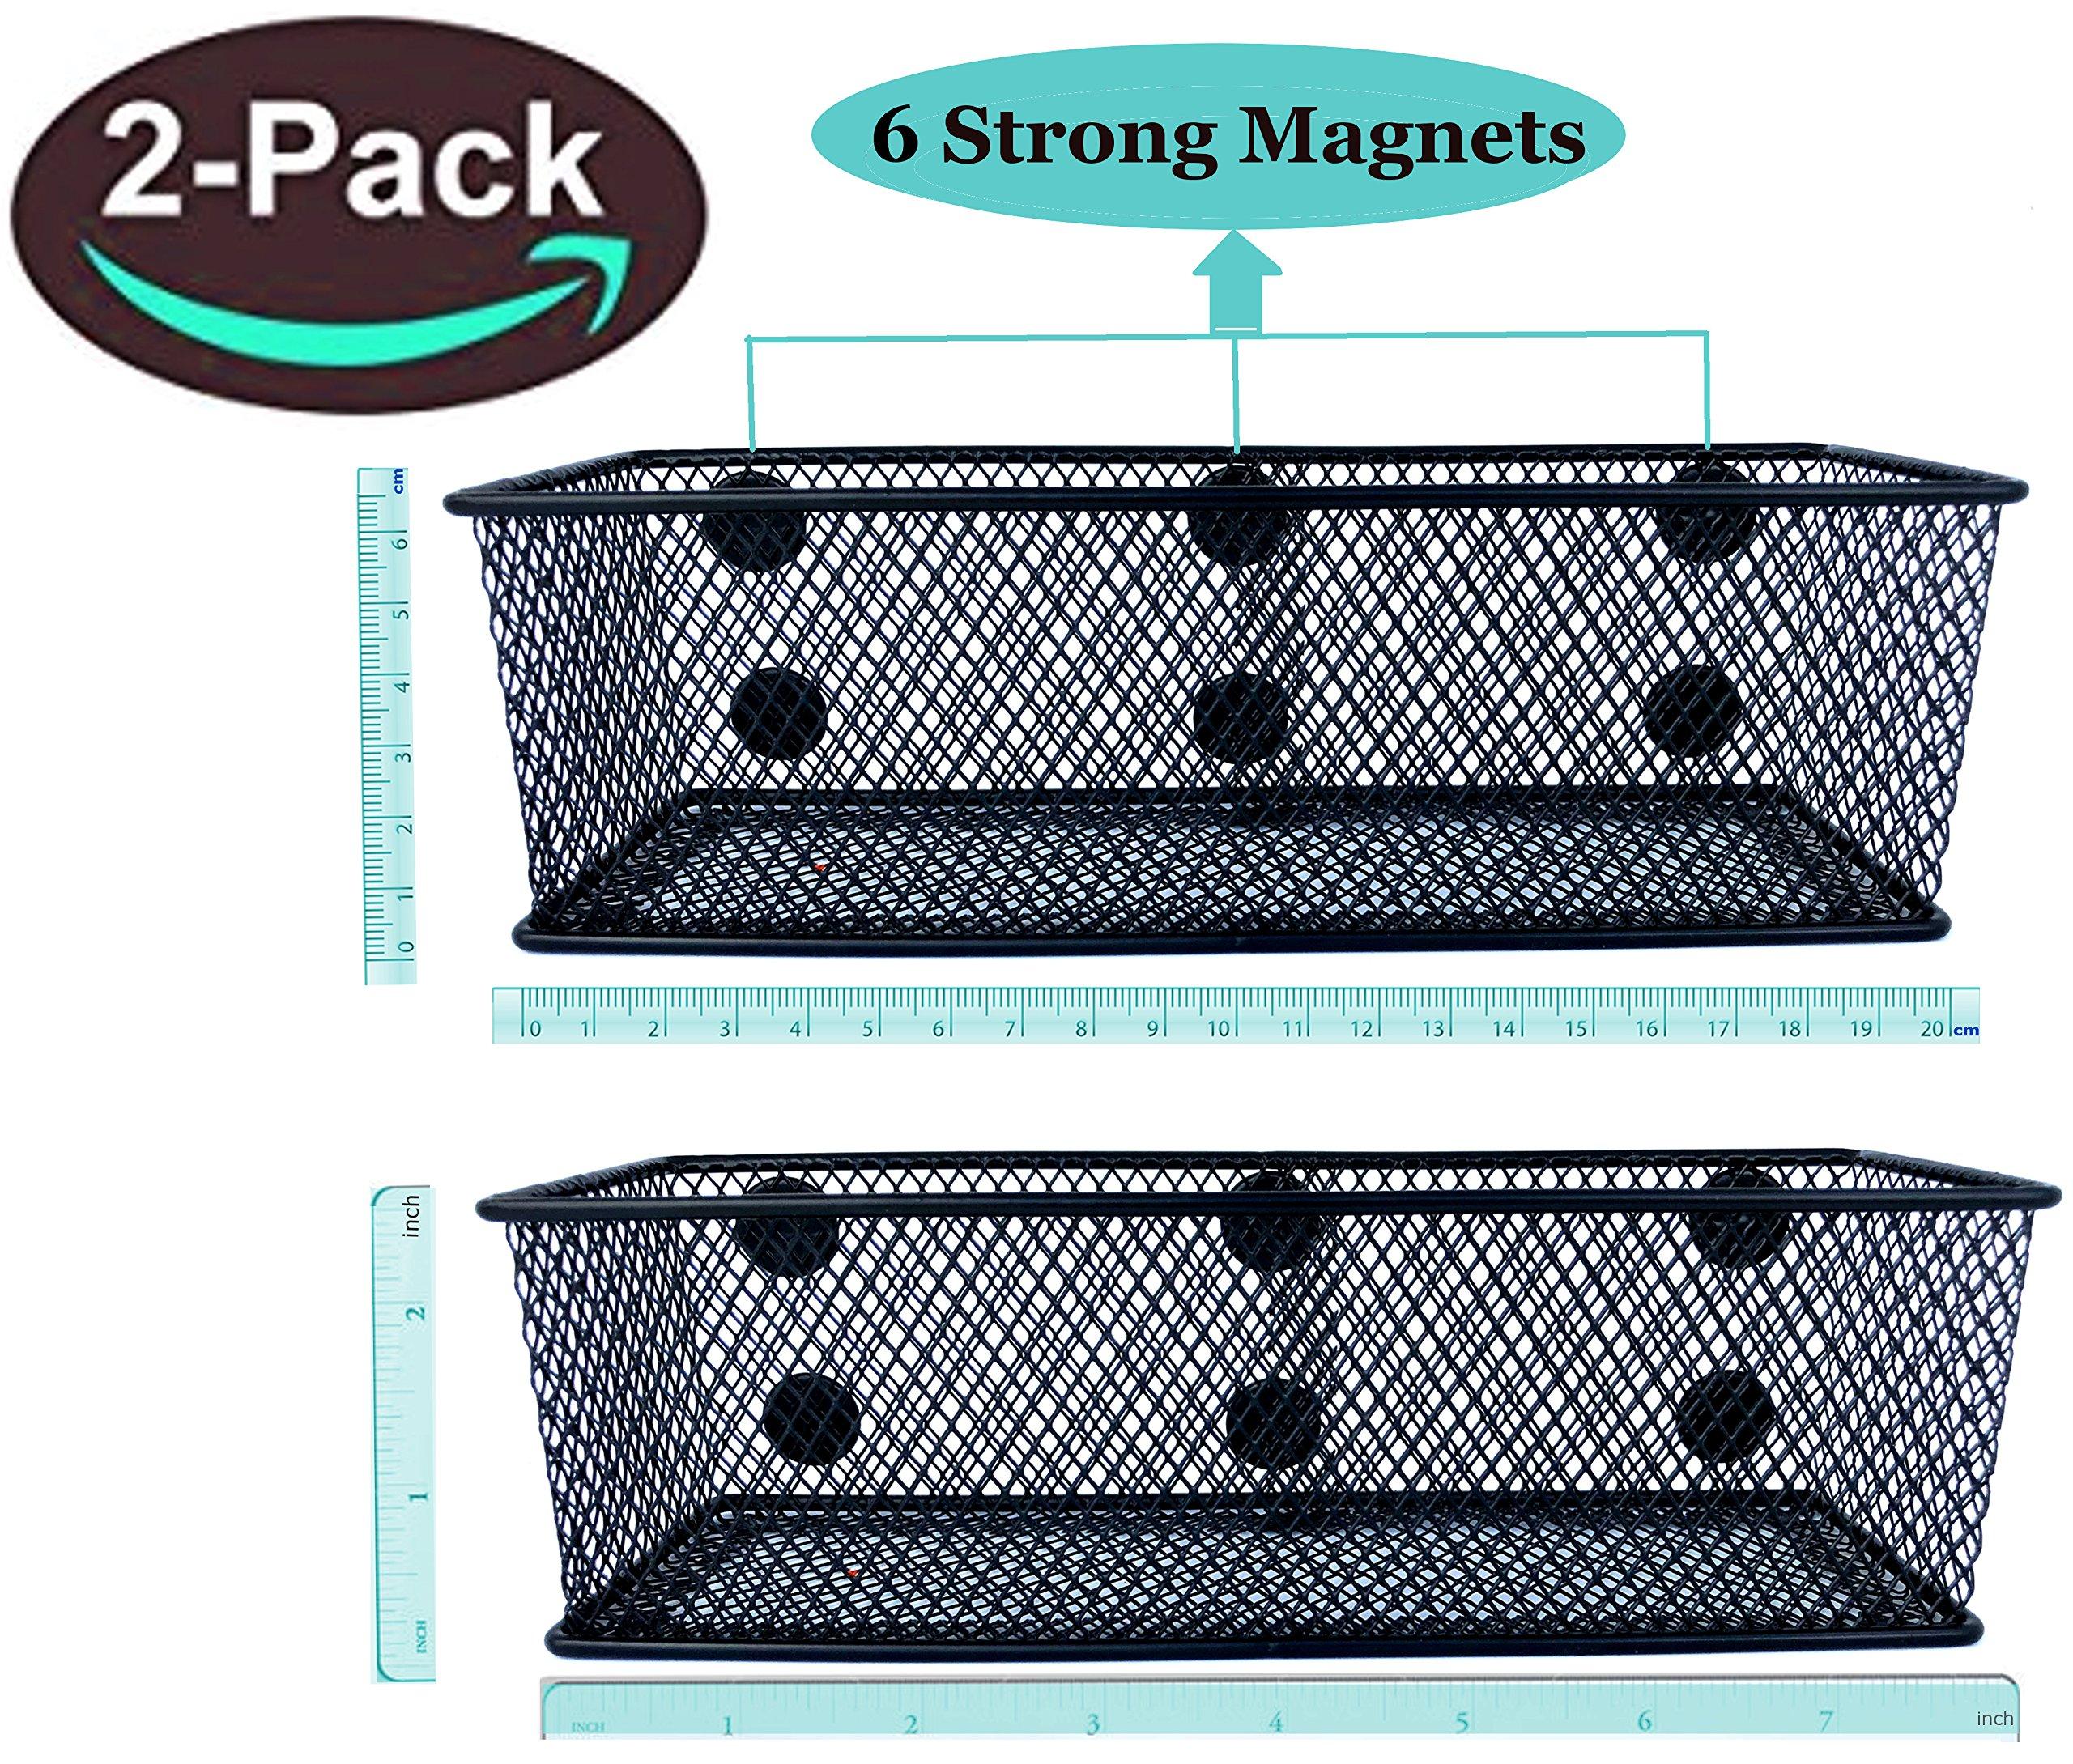 Premium Magnetic Locker Organizer Magnetic Marker Holder Locker Pencil Holder Locker Storage Basket Magnetic Organizer for Fridge and Whiteboard-7.8'' Wide-6 Strong Magnets-Set of 2-Black